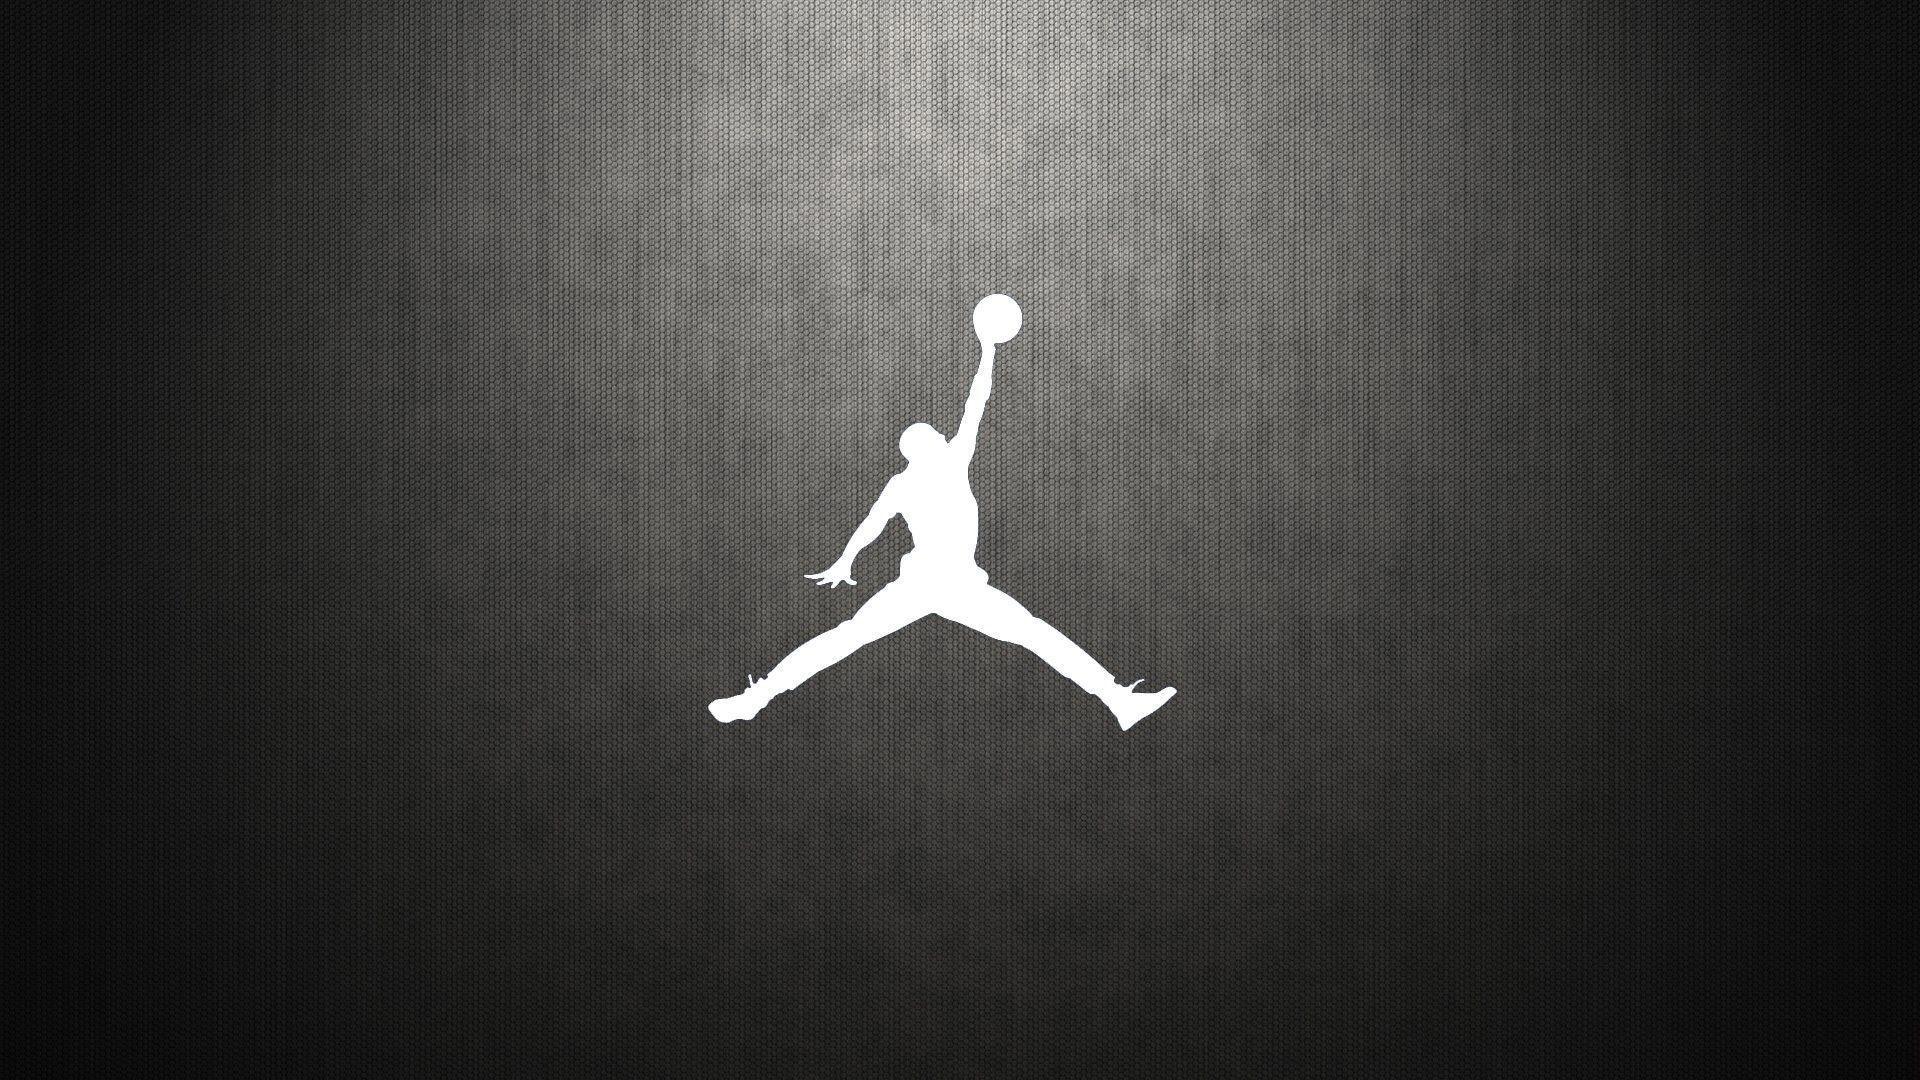 300+ Wallpaper Hd Android Basketball  Gratis